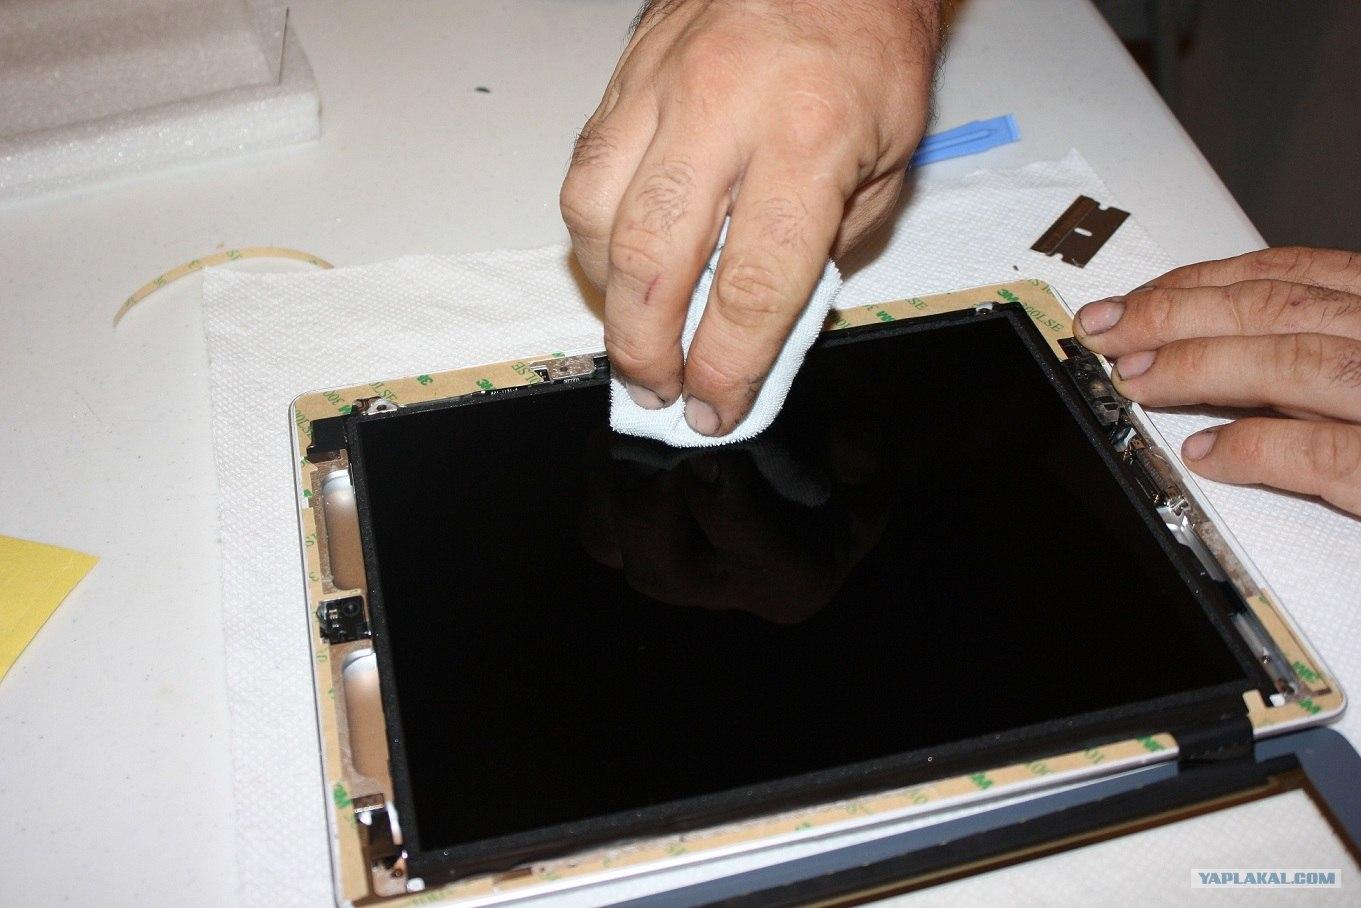 Замена стекла айпад 2 своими руками